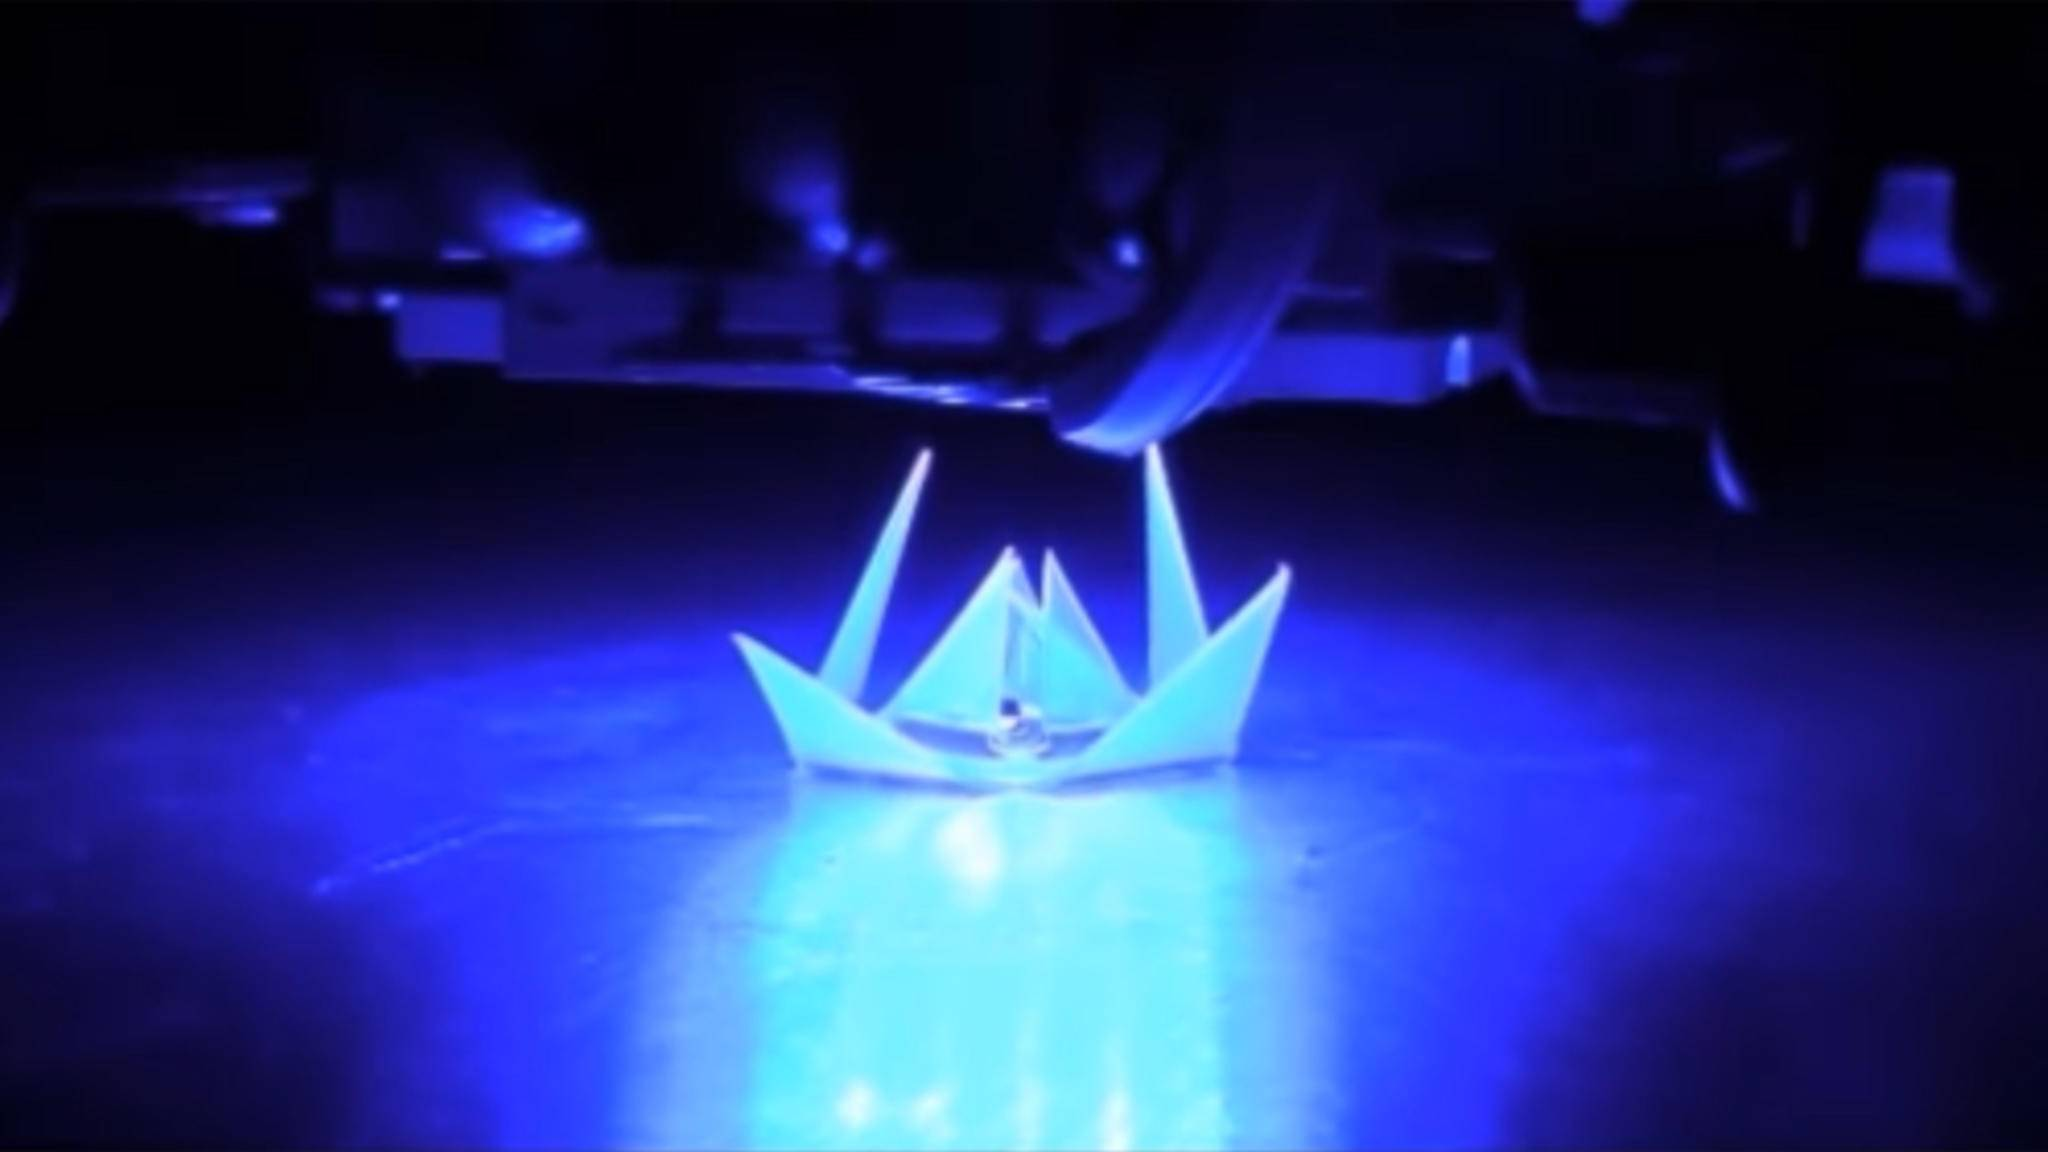 Diese Origami-Lotusblüte kann sich selbst falten.